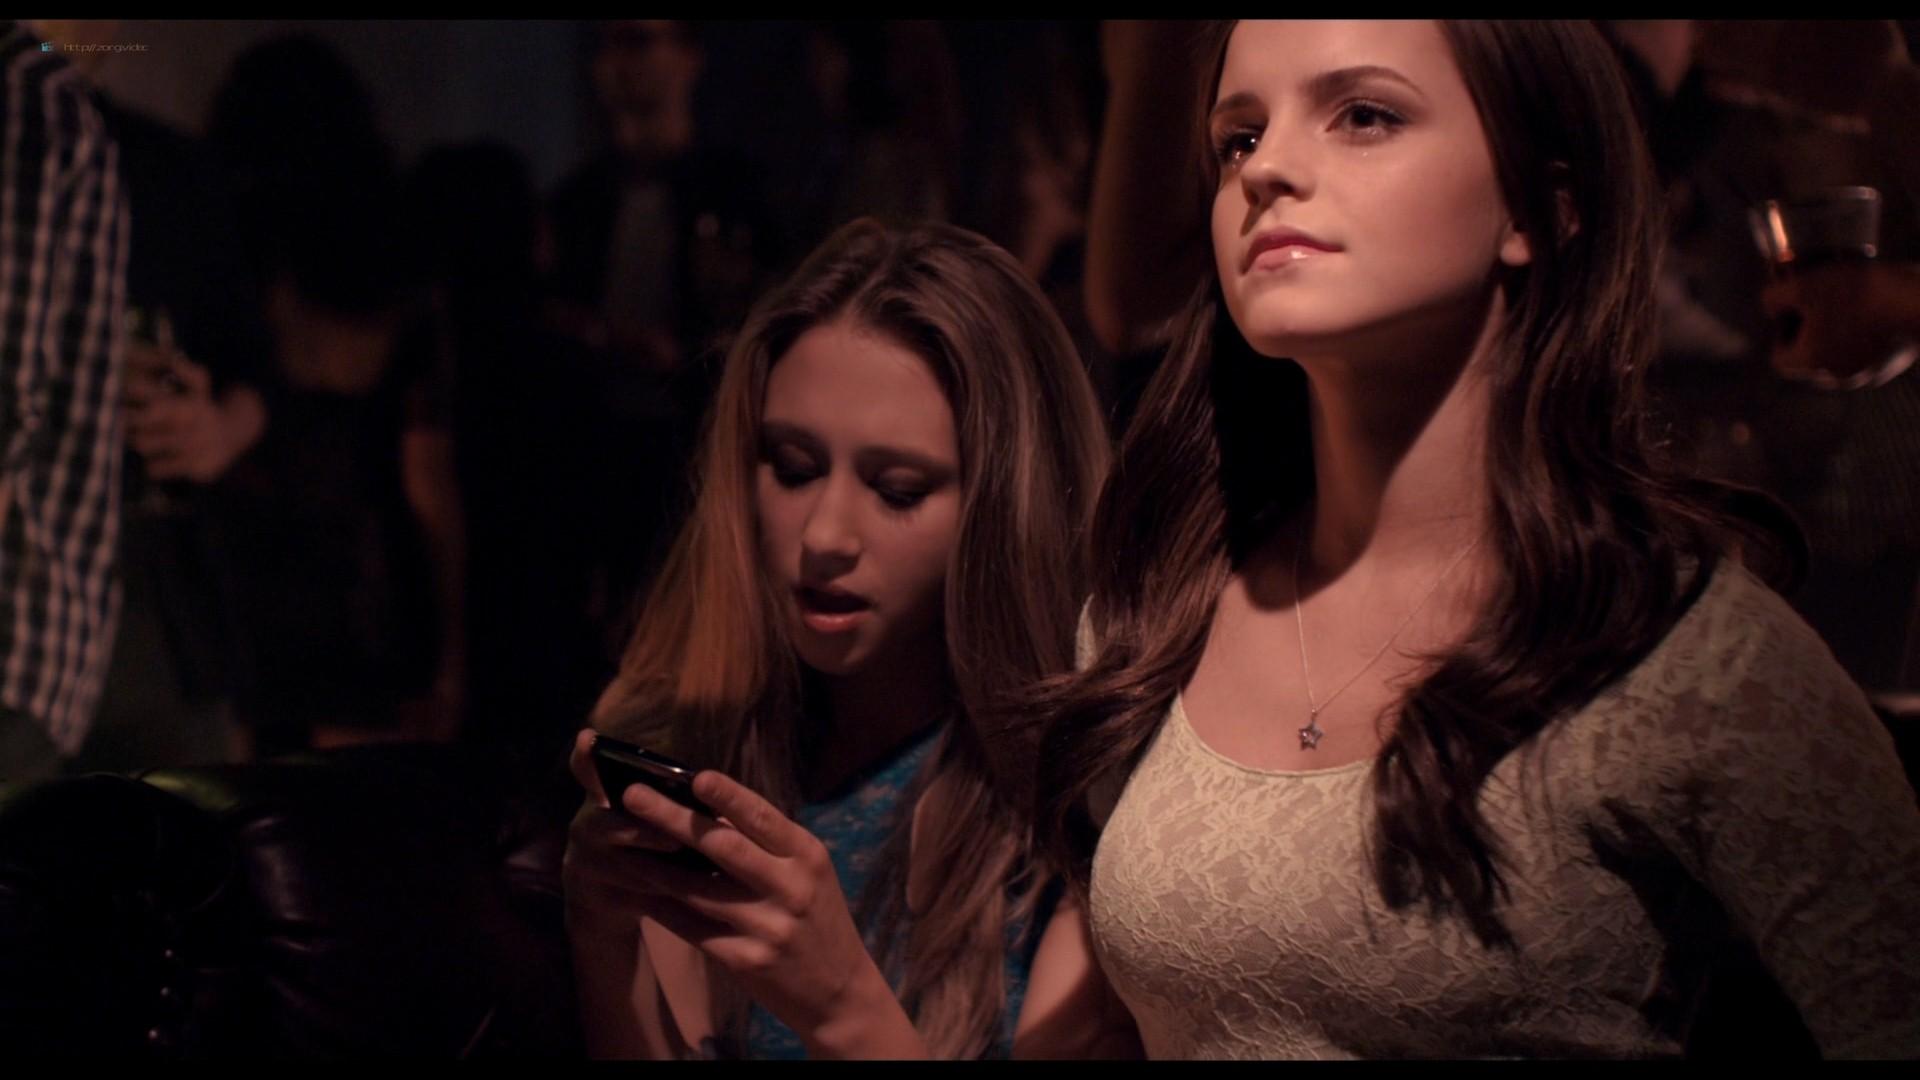 Emma Watson hot Taissa Farmiga and others sexy - The Bling Ring (2013) HD 1080p BluRay (18)